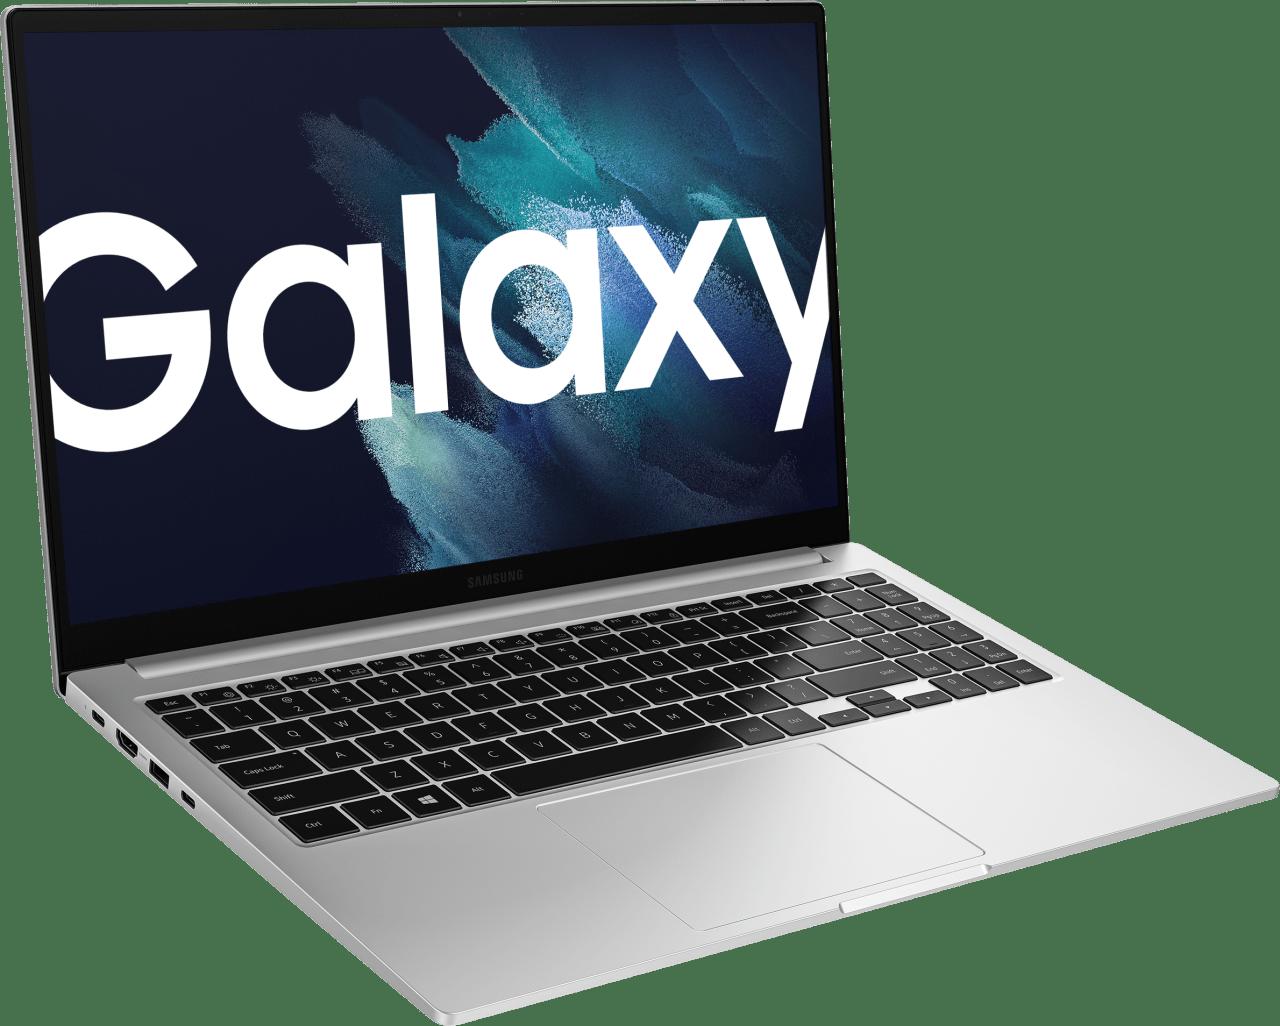 Mystic Silver Samsung Galaxy Book Laptop - Intel® Core™ i5-1135G7 - 8GB - 256GB SSD - Intel® Iris® Xe Graphics.3